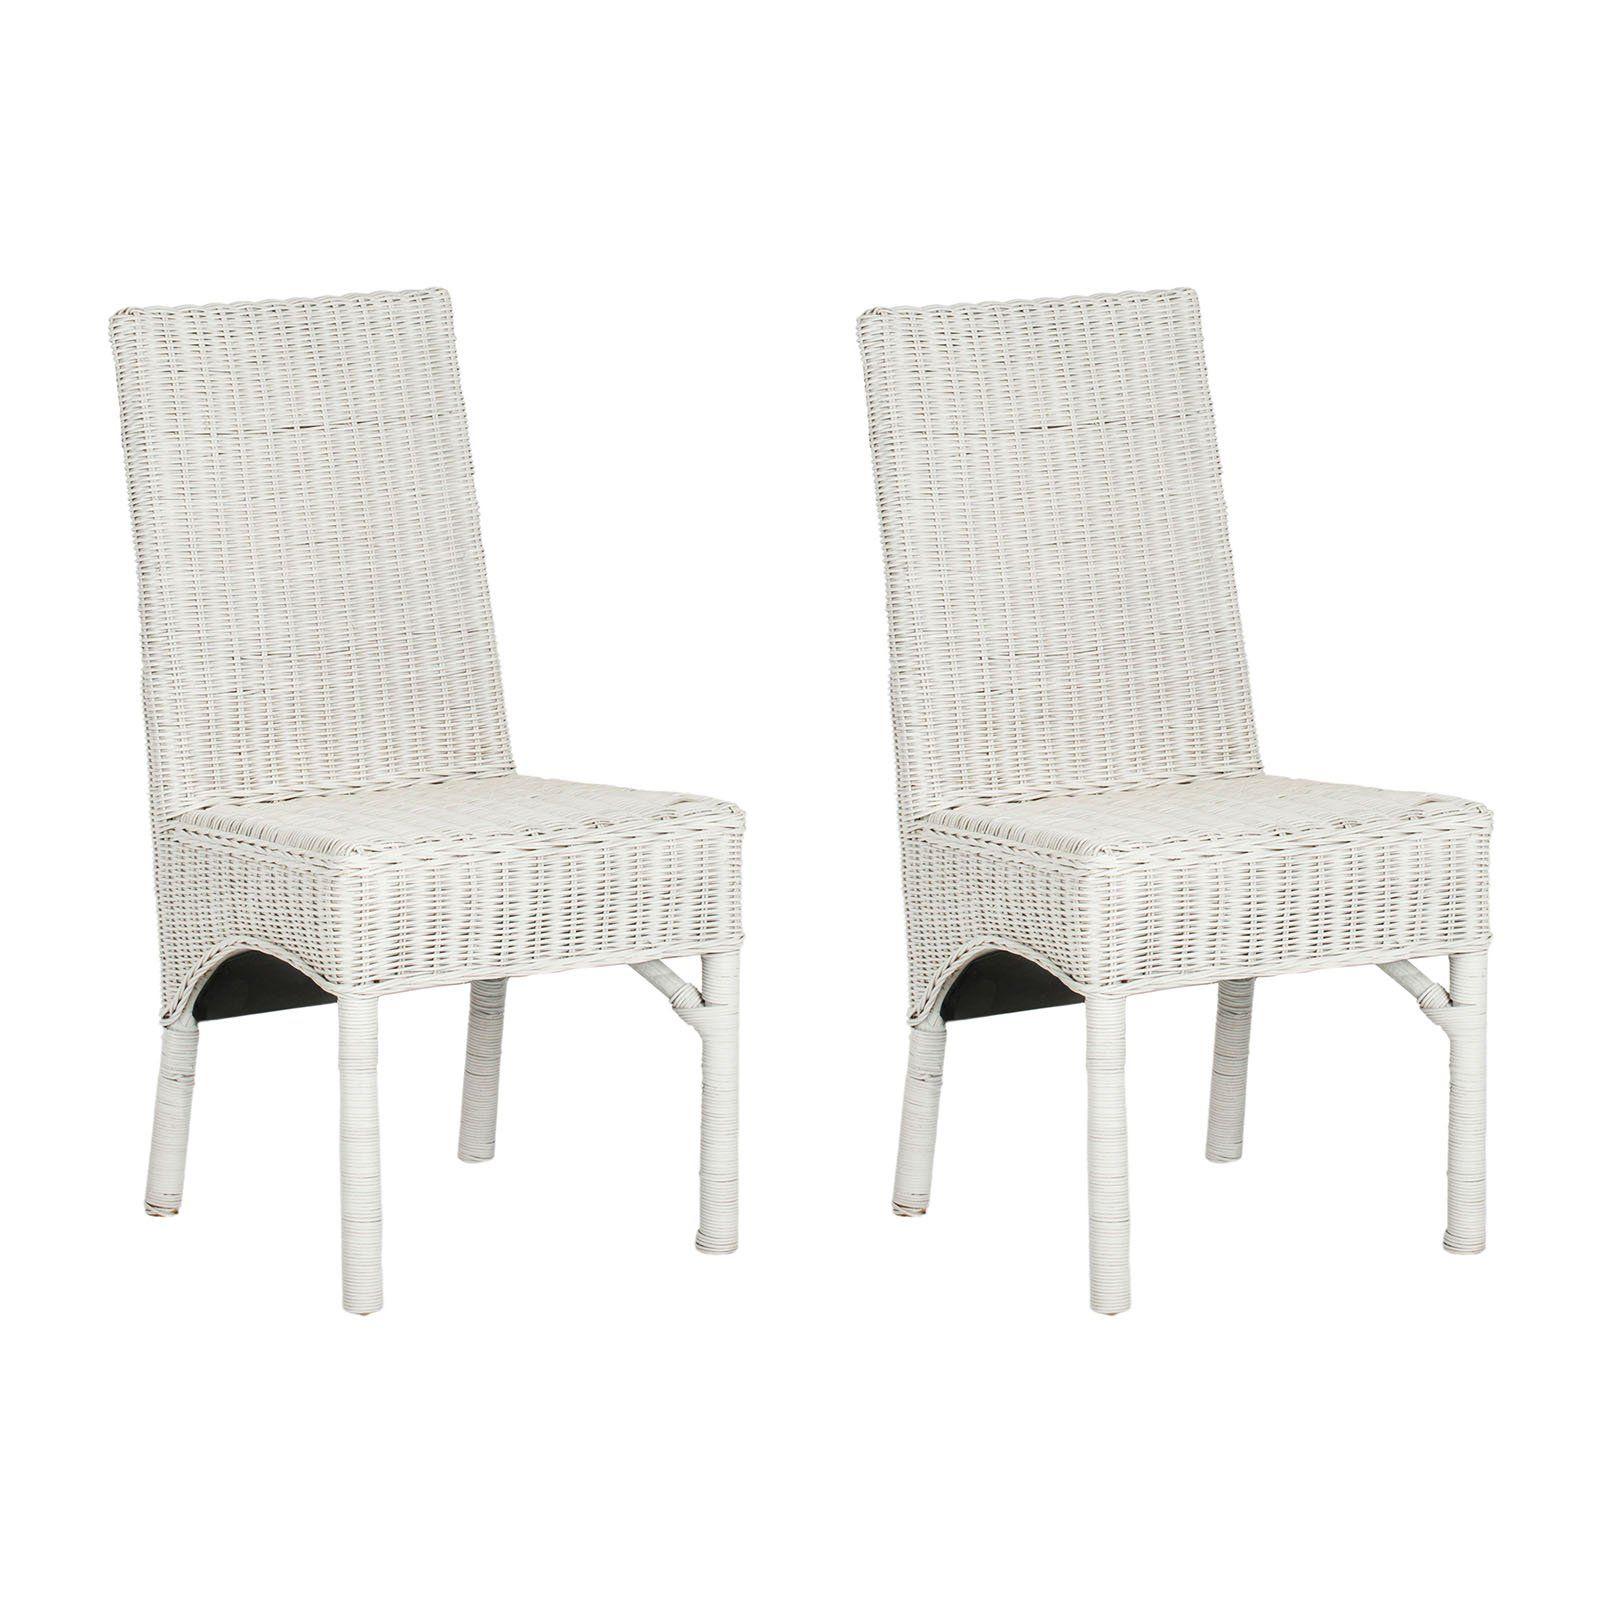 Good White Wicker Furniture With Master Sav3355 Jpg Esszimmerstuhl Beistellstuhl Korbstuhle